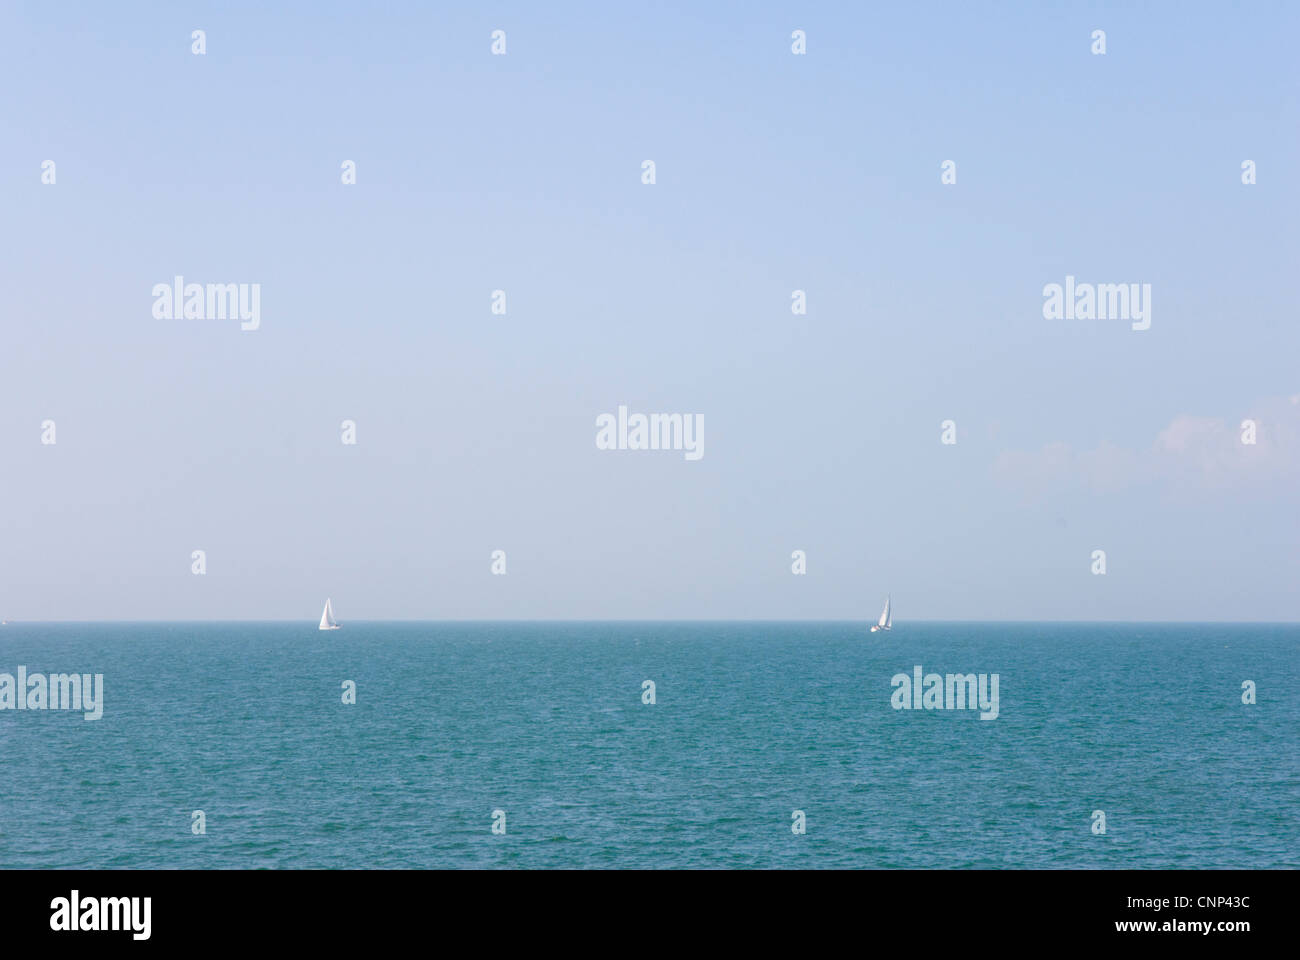 Blue/green sea blue sky white sails on the horizon moving apart - Stock Image